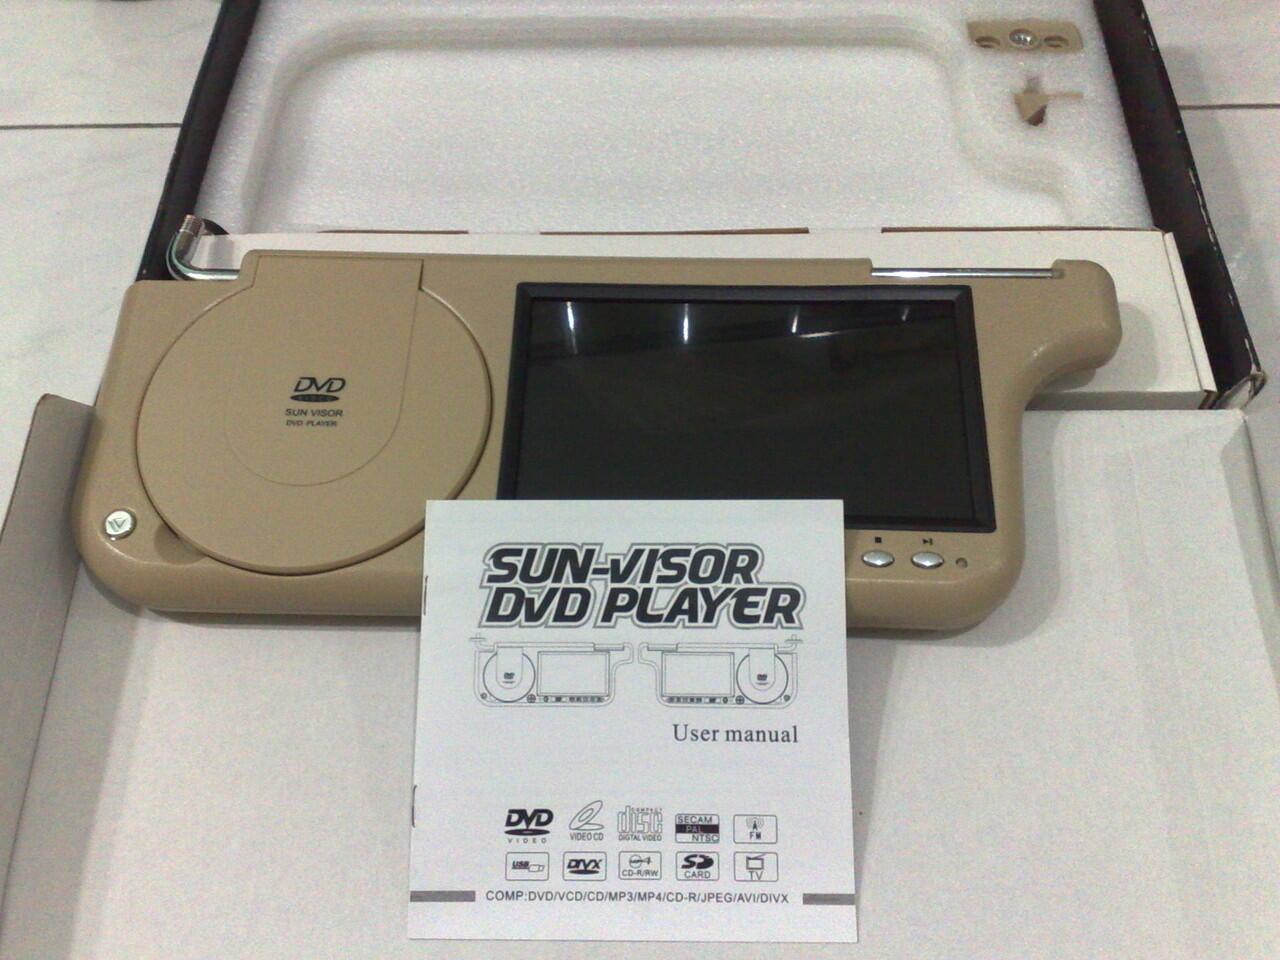 SUN VISOR DVD Player